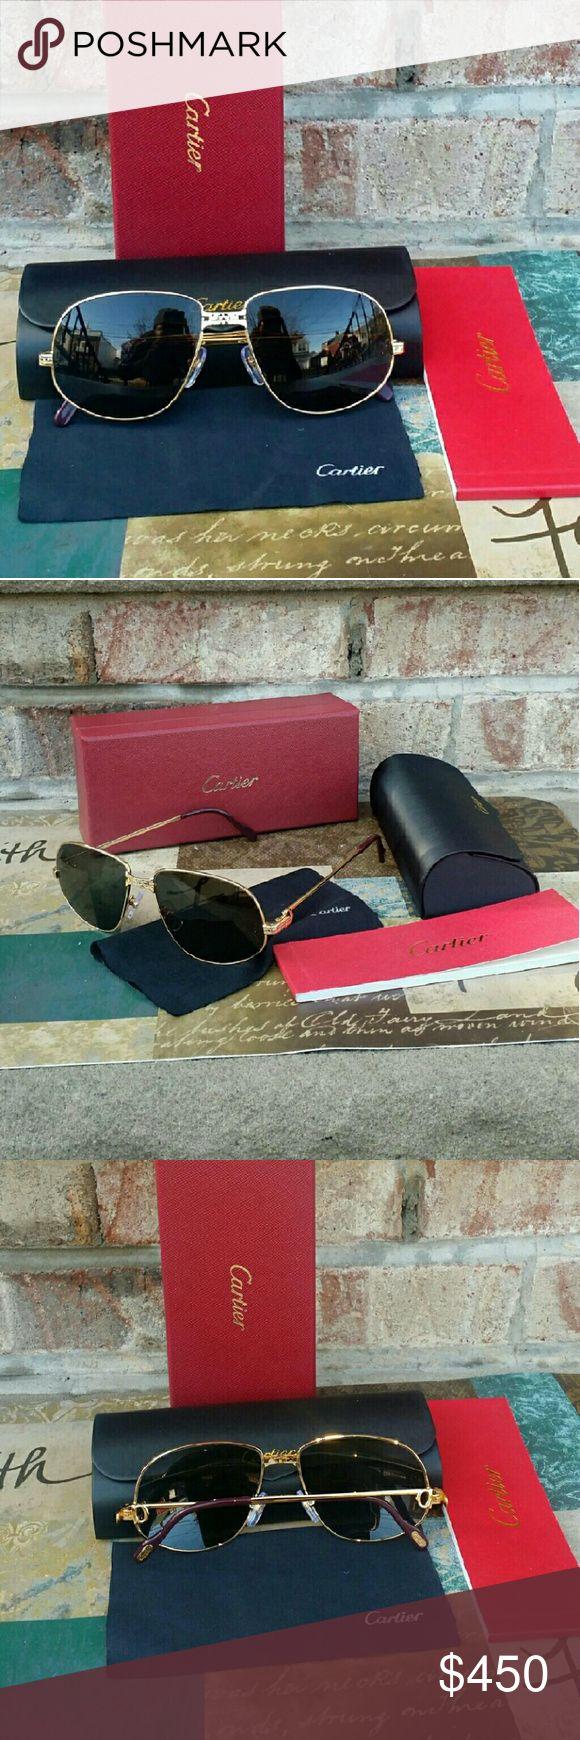 Cartier Luxury Quality Unisex Sunglasses Cartier Luxury Quality Unisex Sunglasses Brand New. Cartier Accessories Glasses